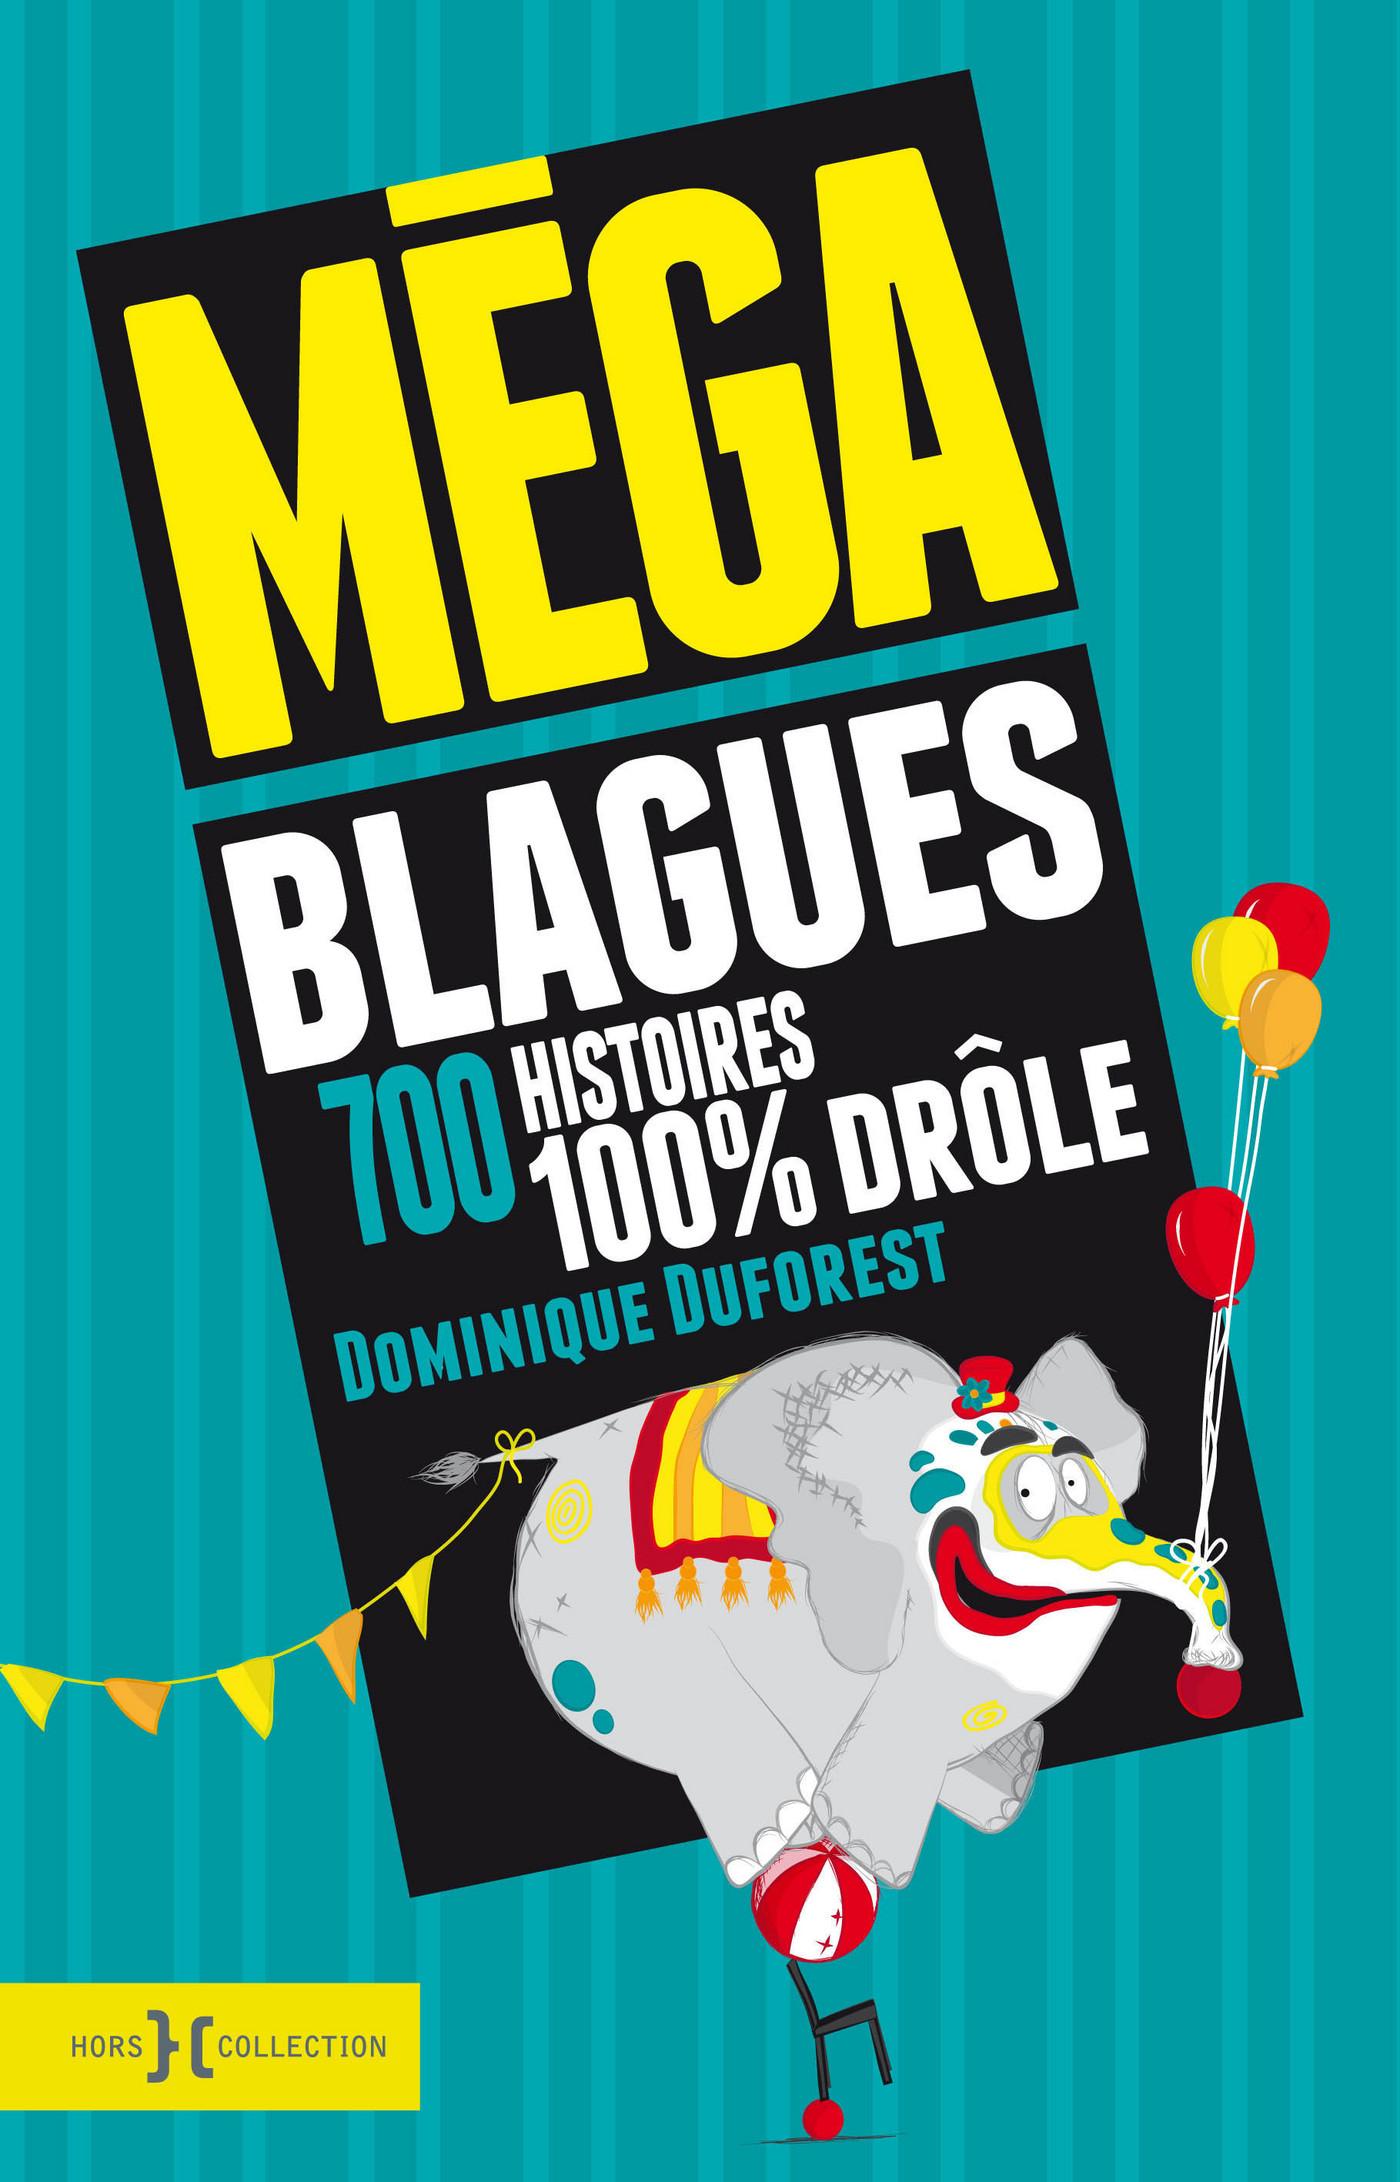 Méga blagues, 700 histoires 100% drôles (ebook)